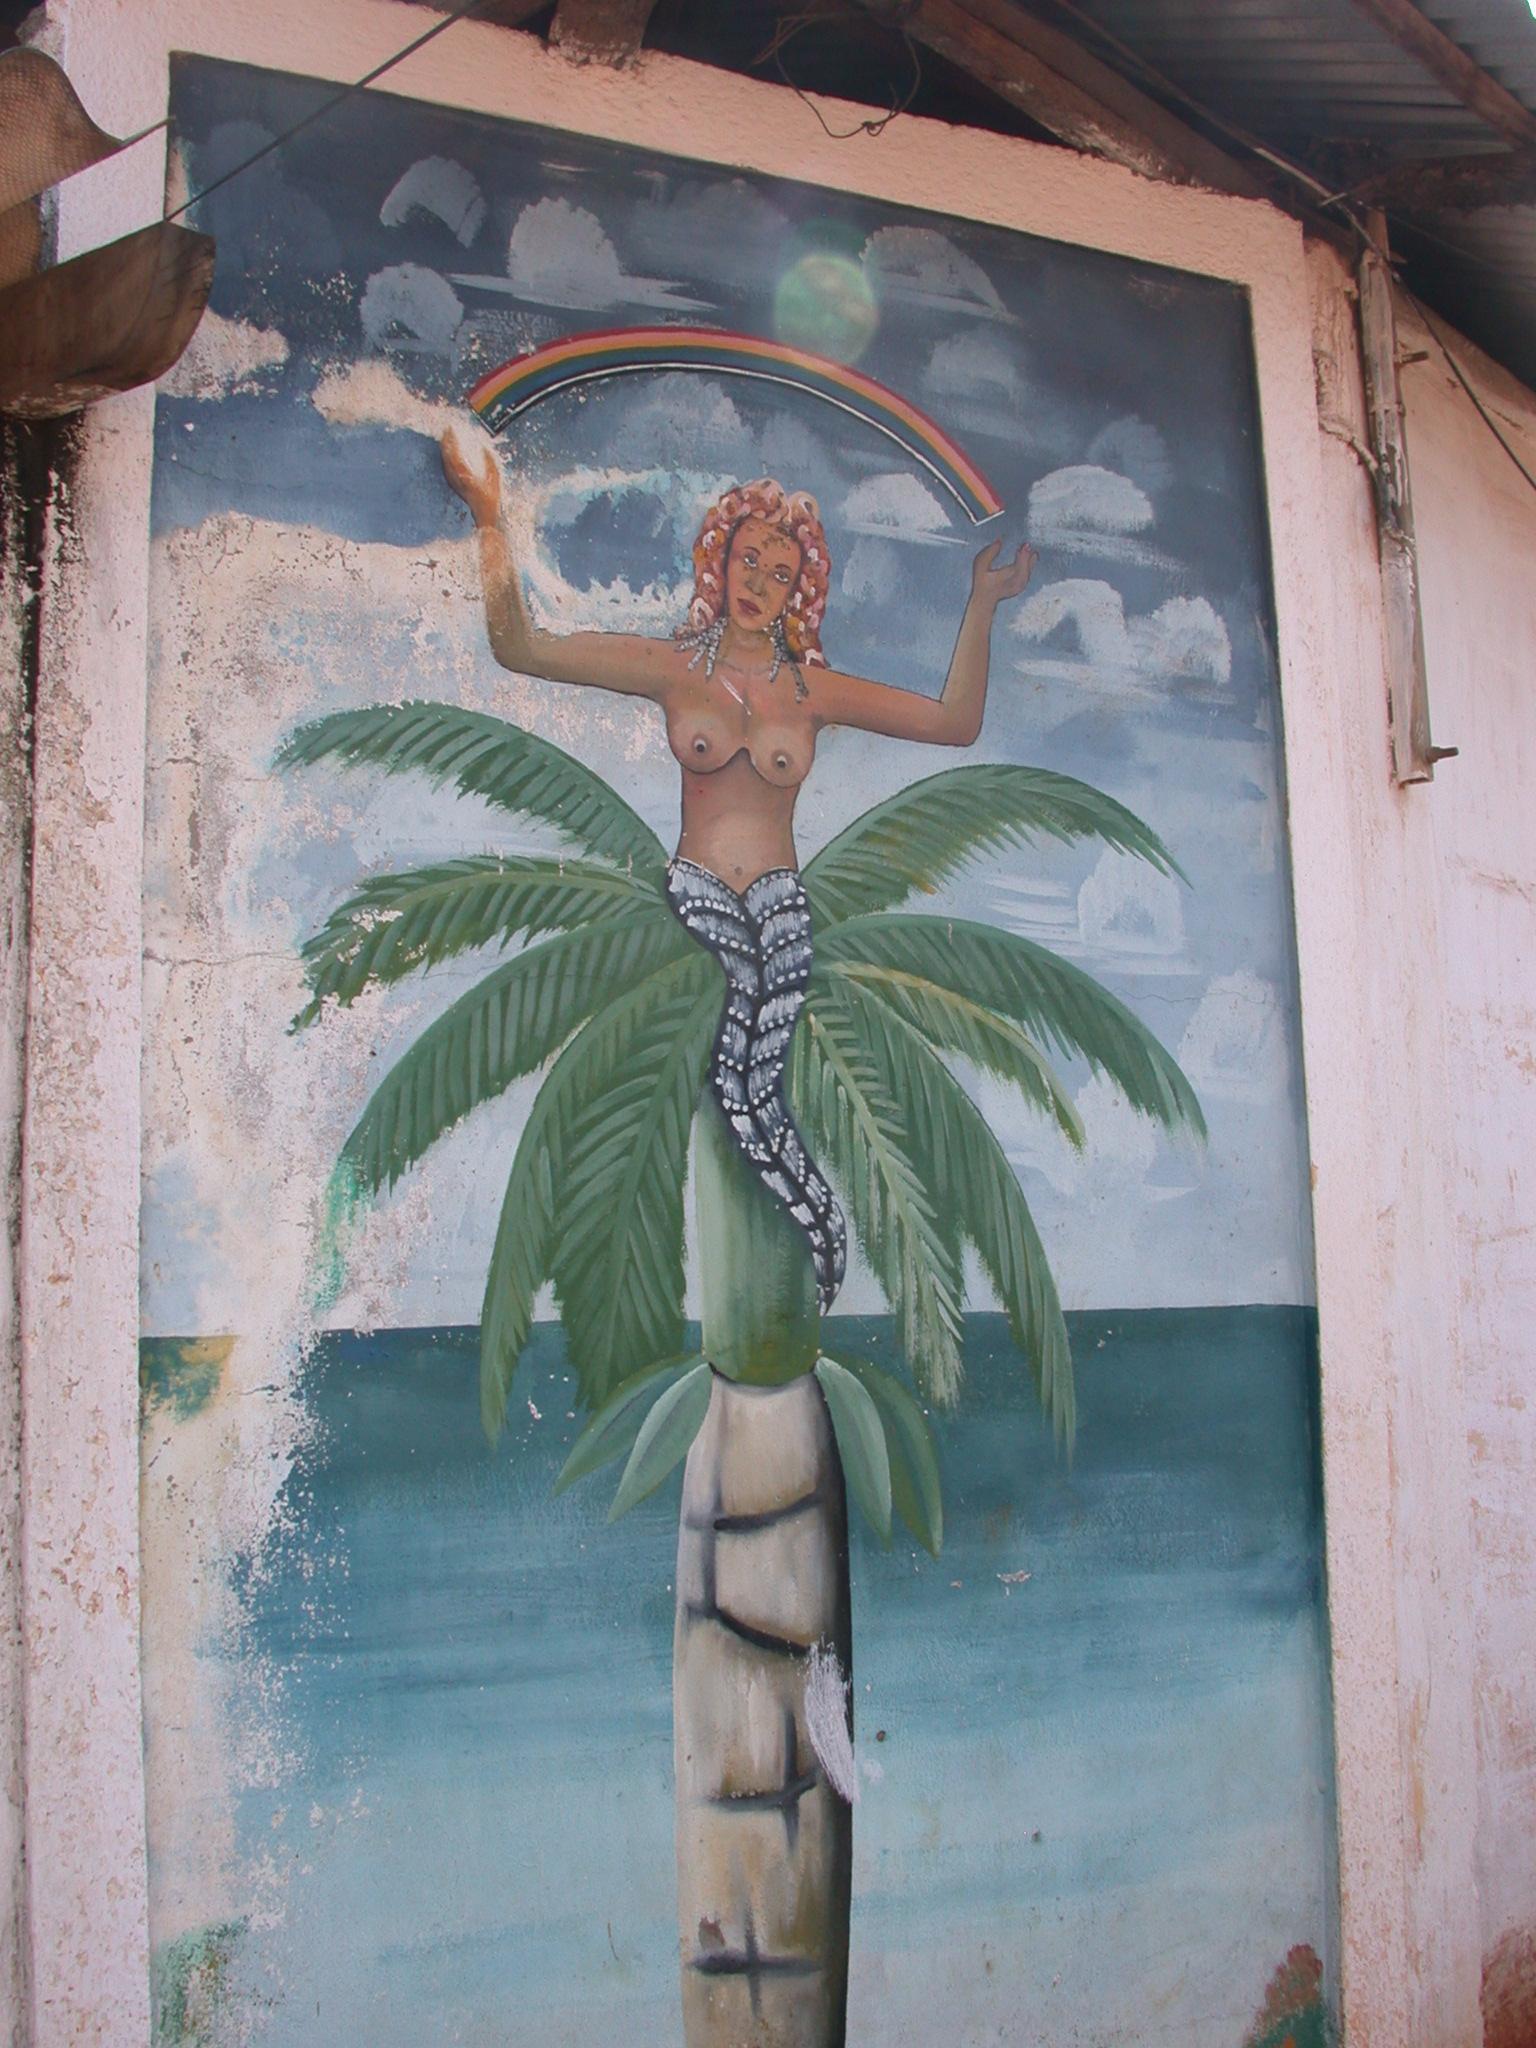 Avlekete Vodun Mermaid Spirit Mural, Daagbo Hounon Dodo Palace, Ouidah, Benin